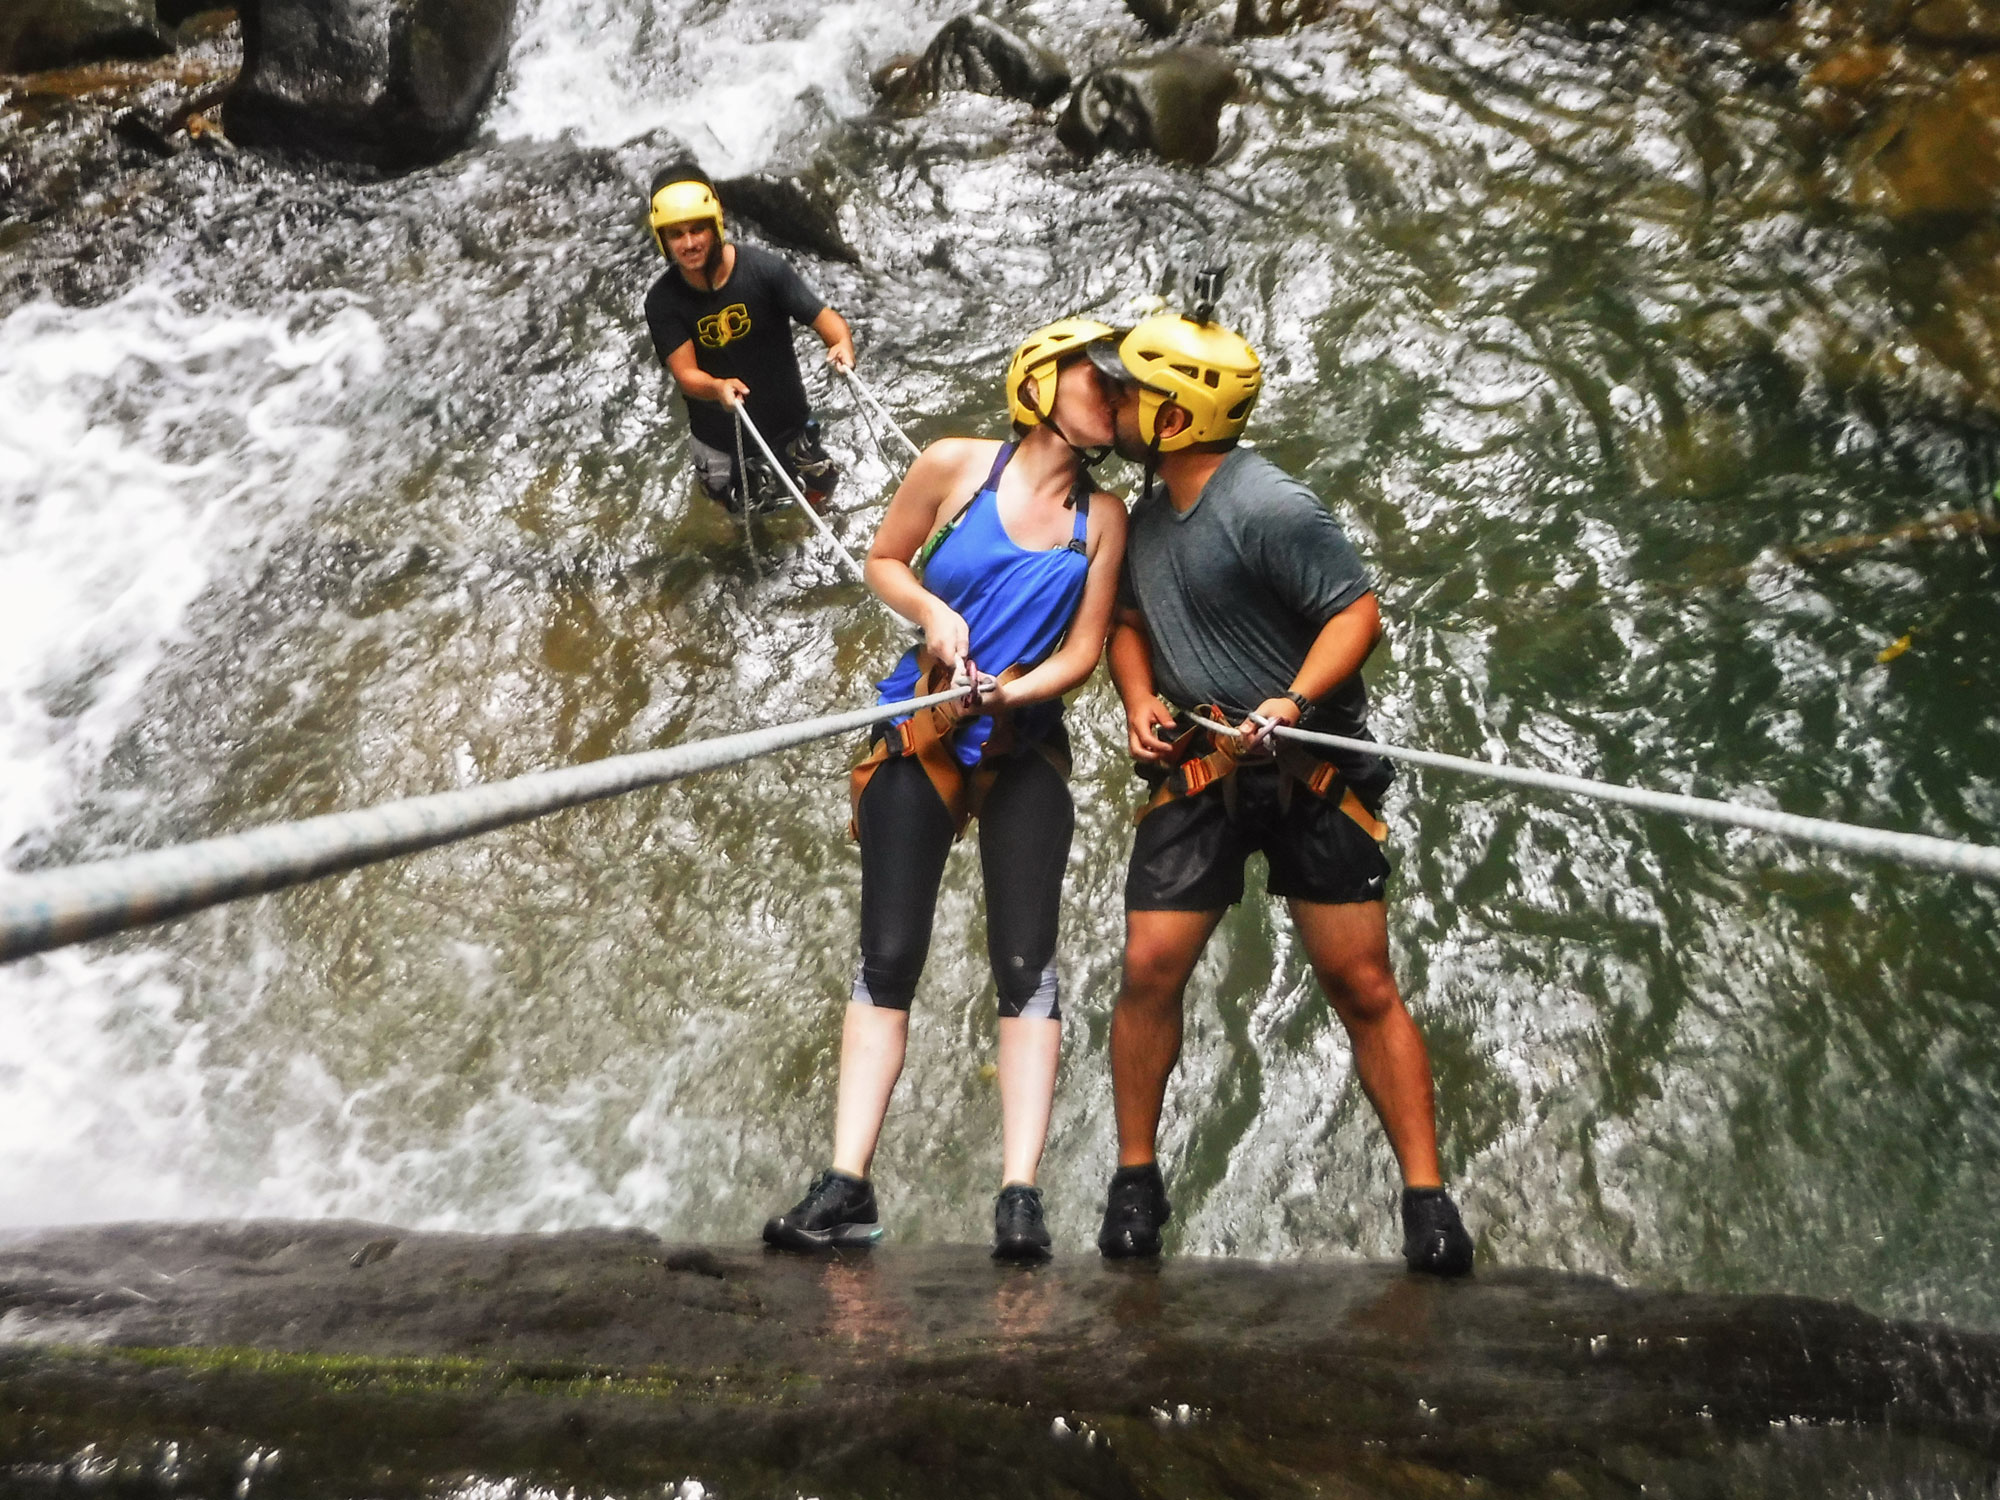 uvita-costa-rica-wander-south-rapelling-ron-and-jess.jpg